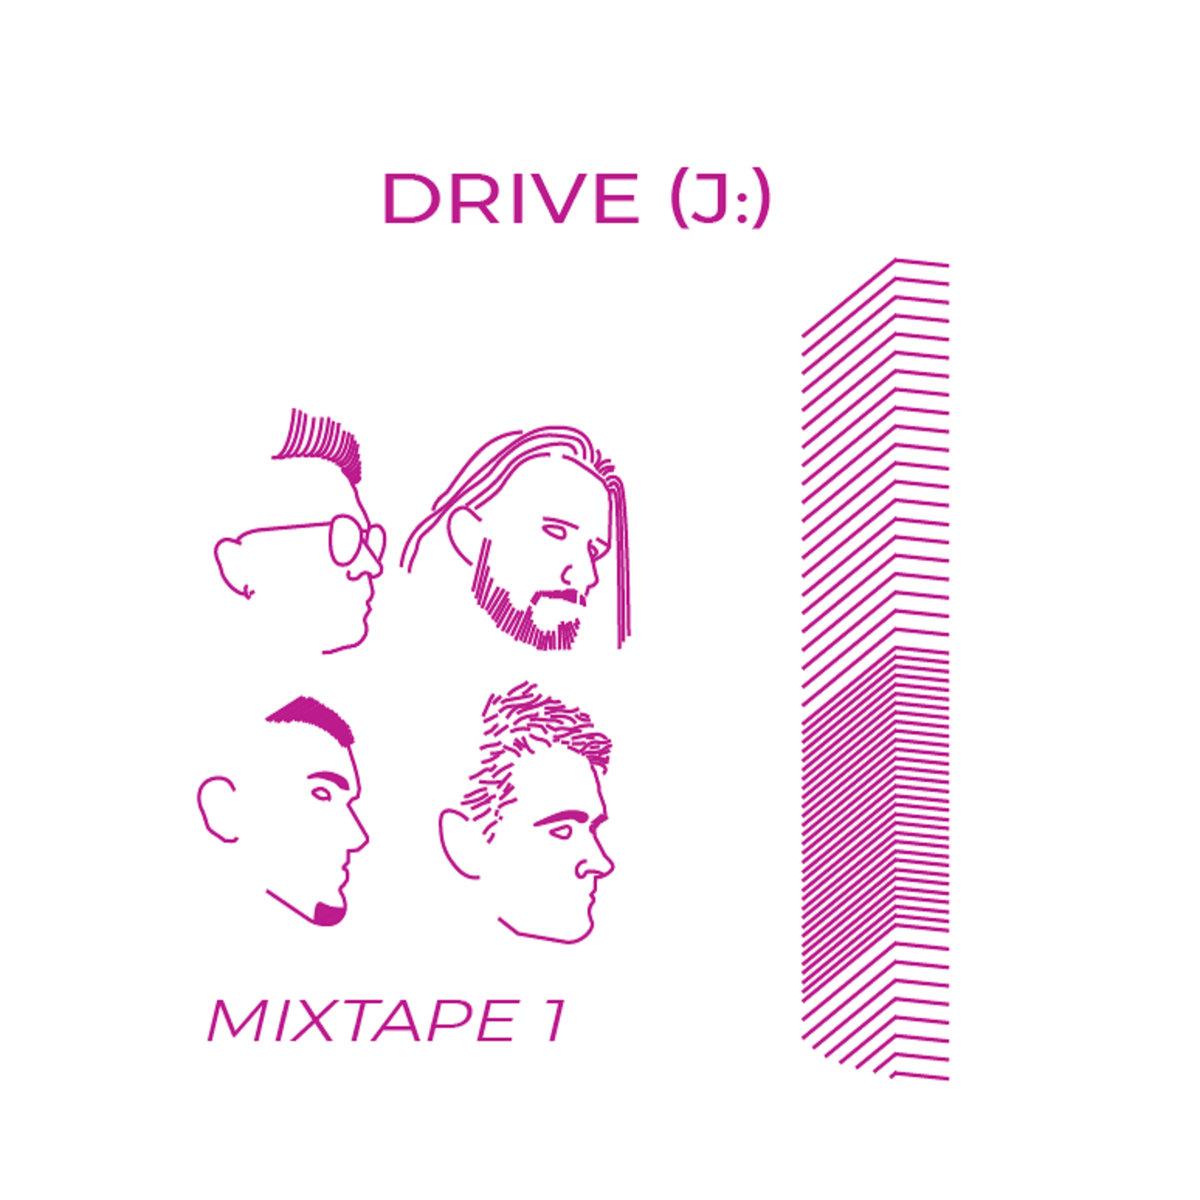 Drive (J:) Mixtape 1